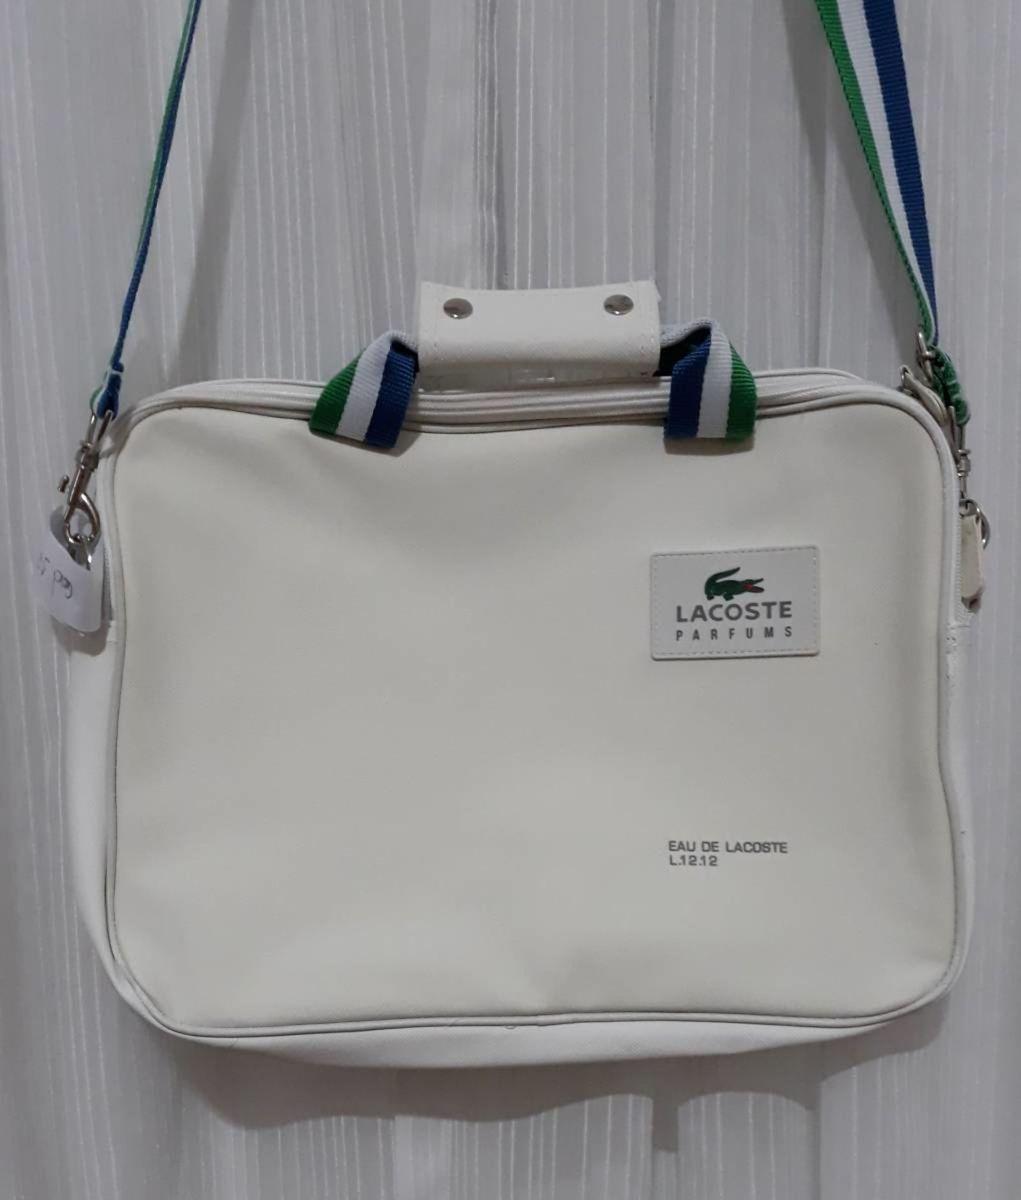 63a2888b7e813 bolsa branca carteiro lacoste - ombro lacoste.  Czm6ly9wag90b3muzw5qb2vplmnvbs5ici9wcm9kdwn0cy8zmtg0nzivzjeyytdjzwmzmwq2yjjkmwrmmty0yte3y2y5ndhjzjyuanbn  ...